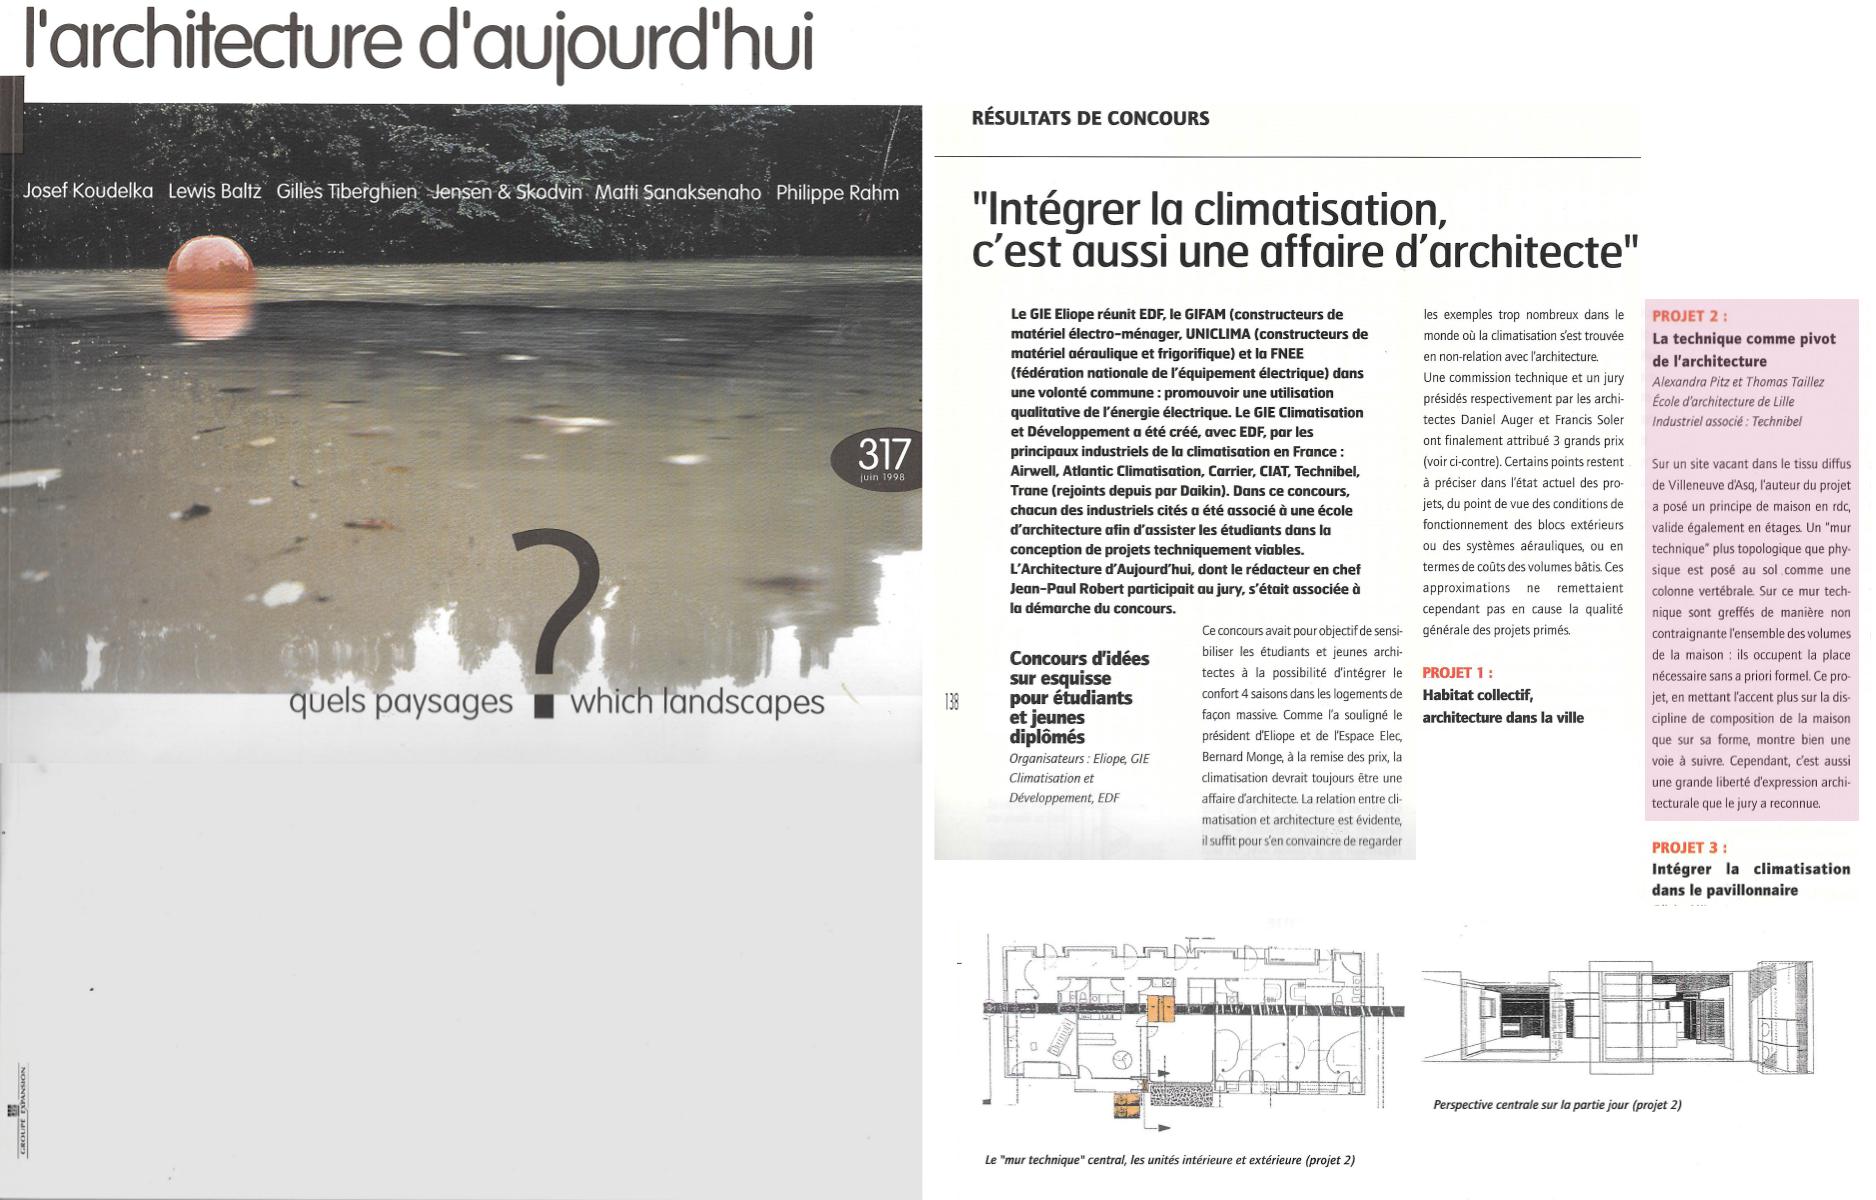 Architecture d'Aujourd'hui p. 138 + 139